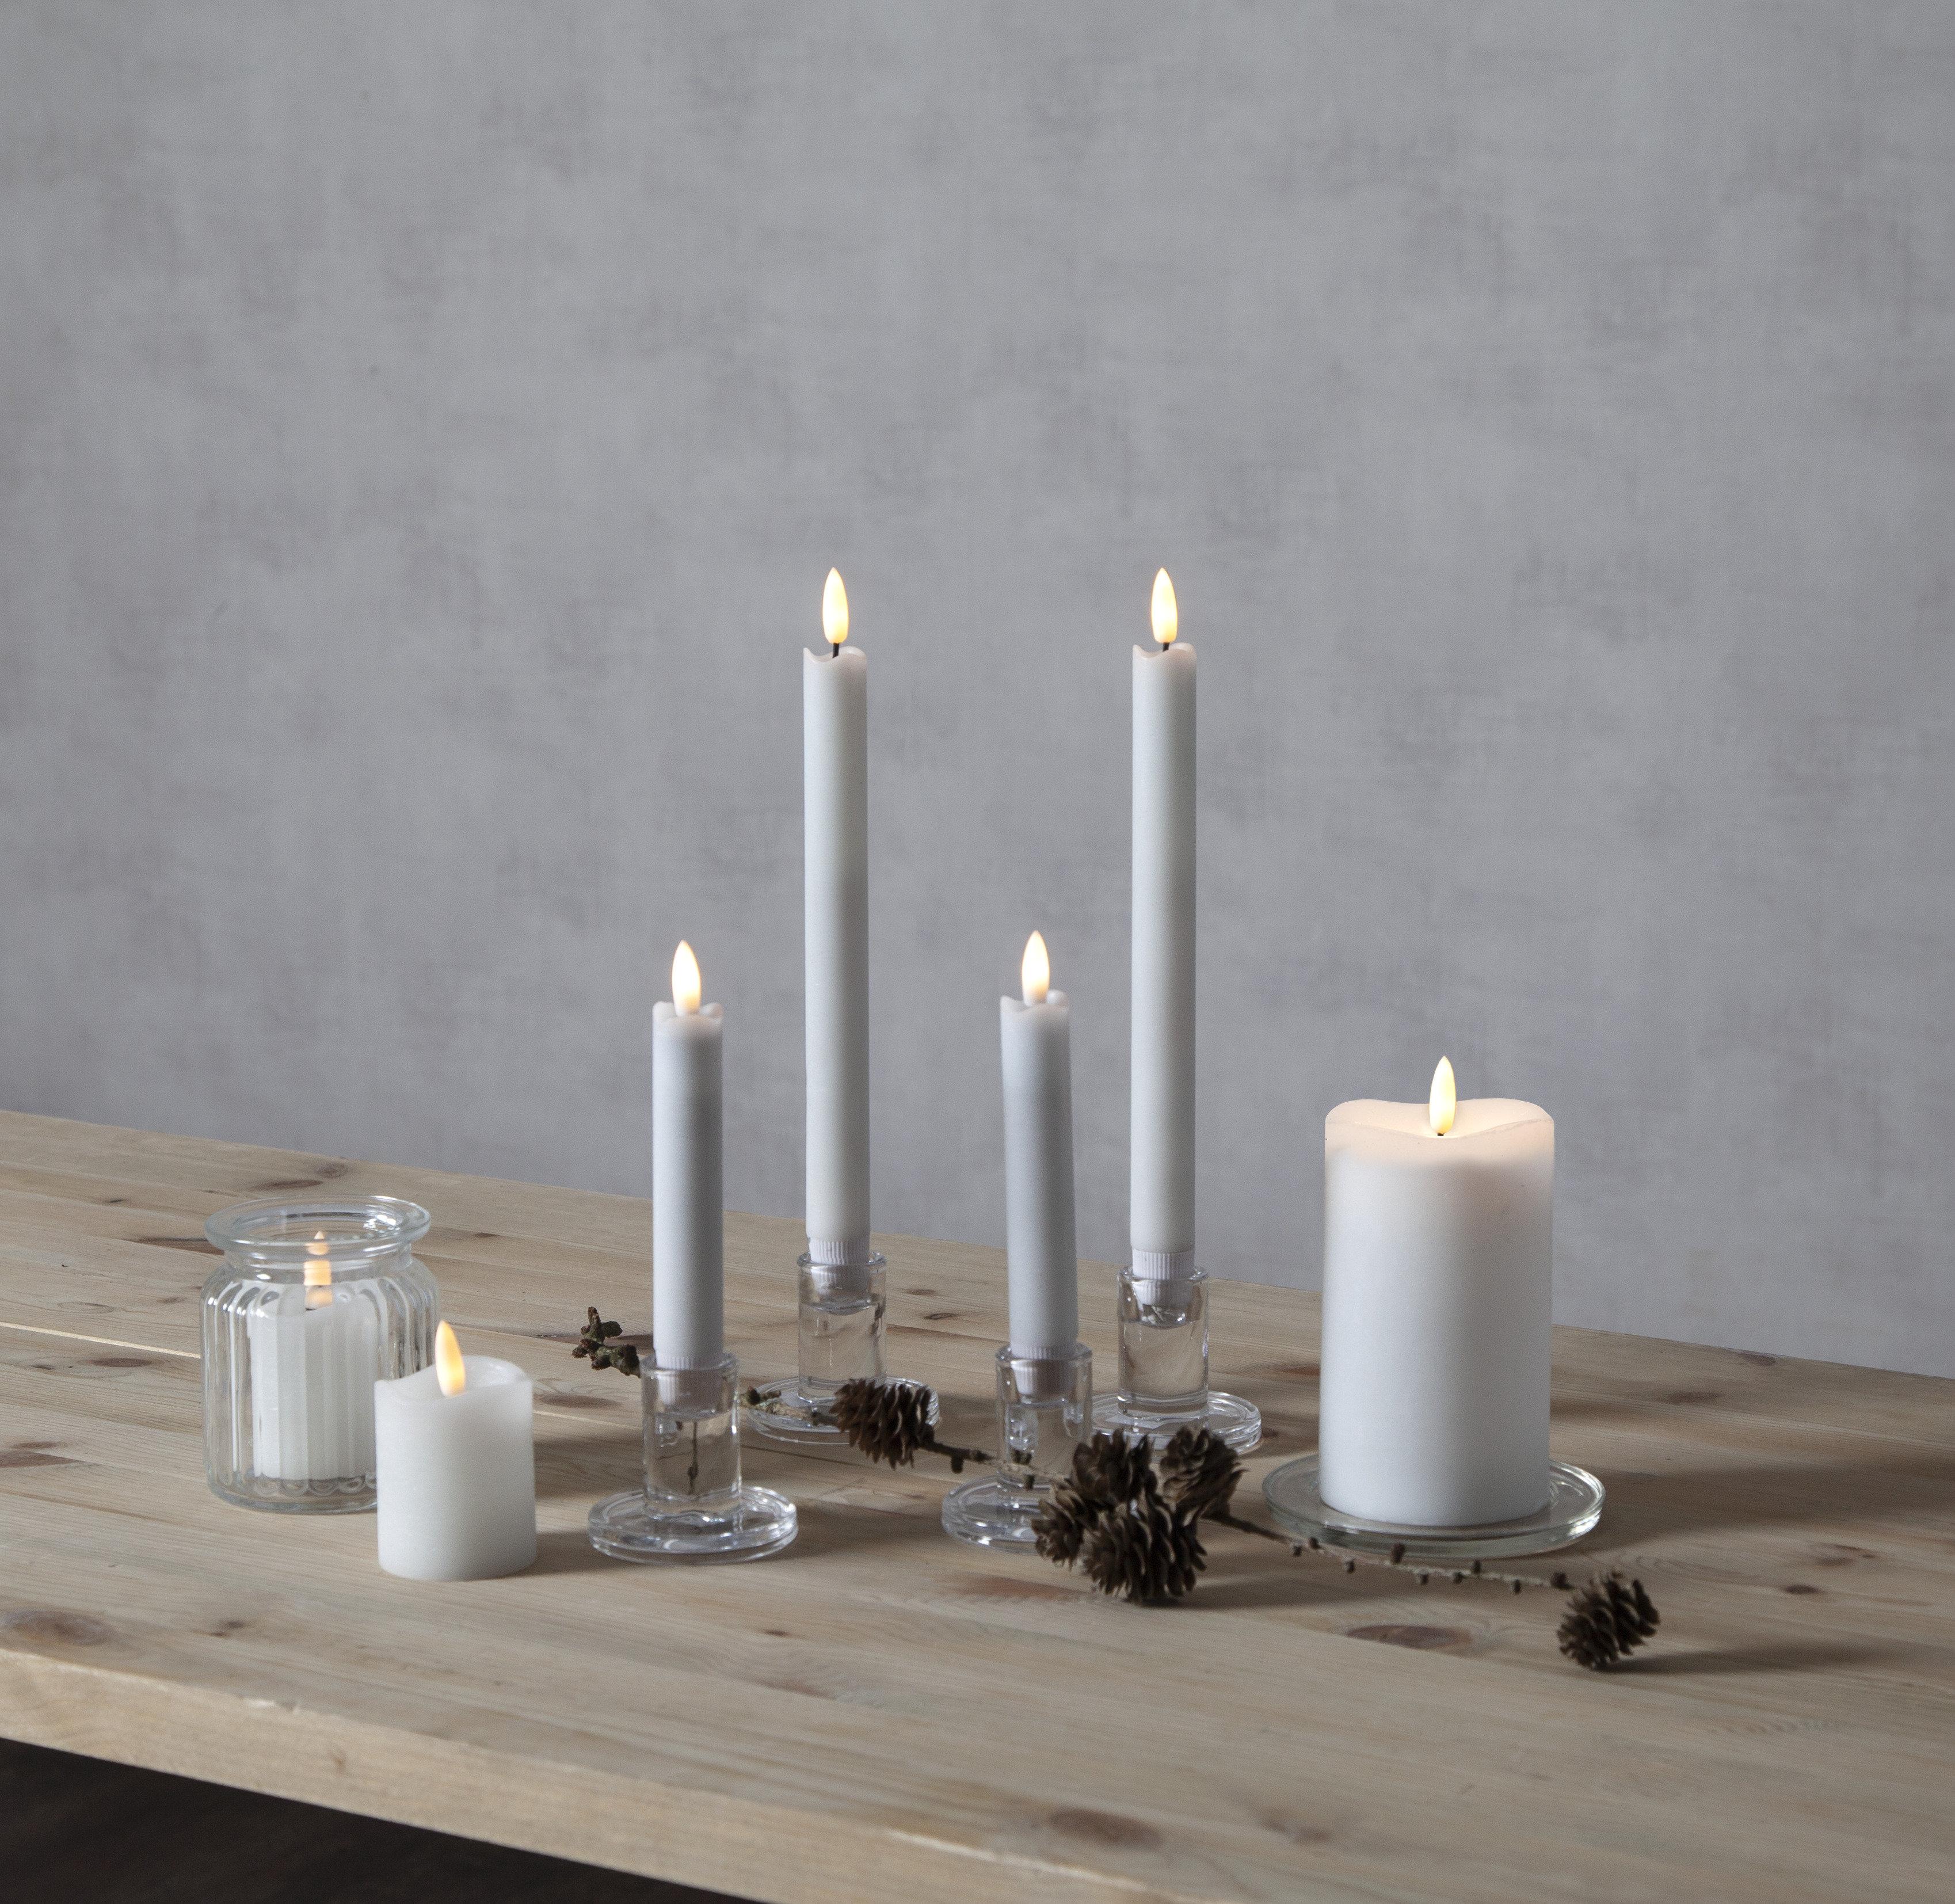 LED garas antīkās sveces Flamme kompl. 2 gabali